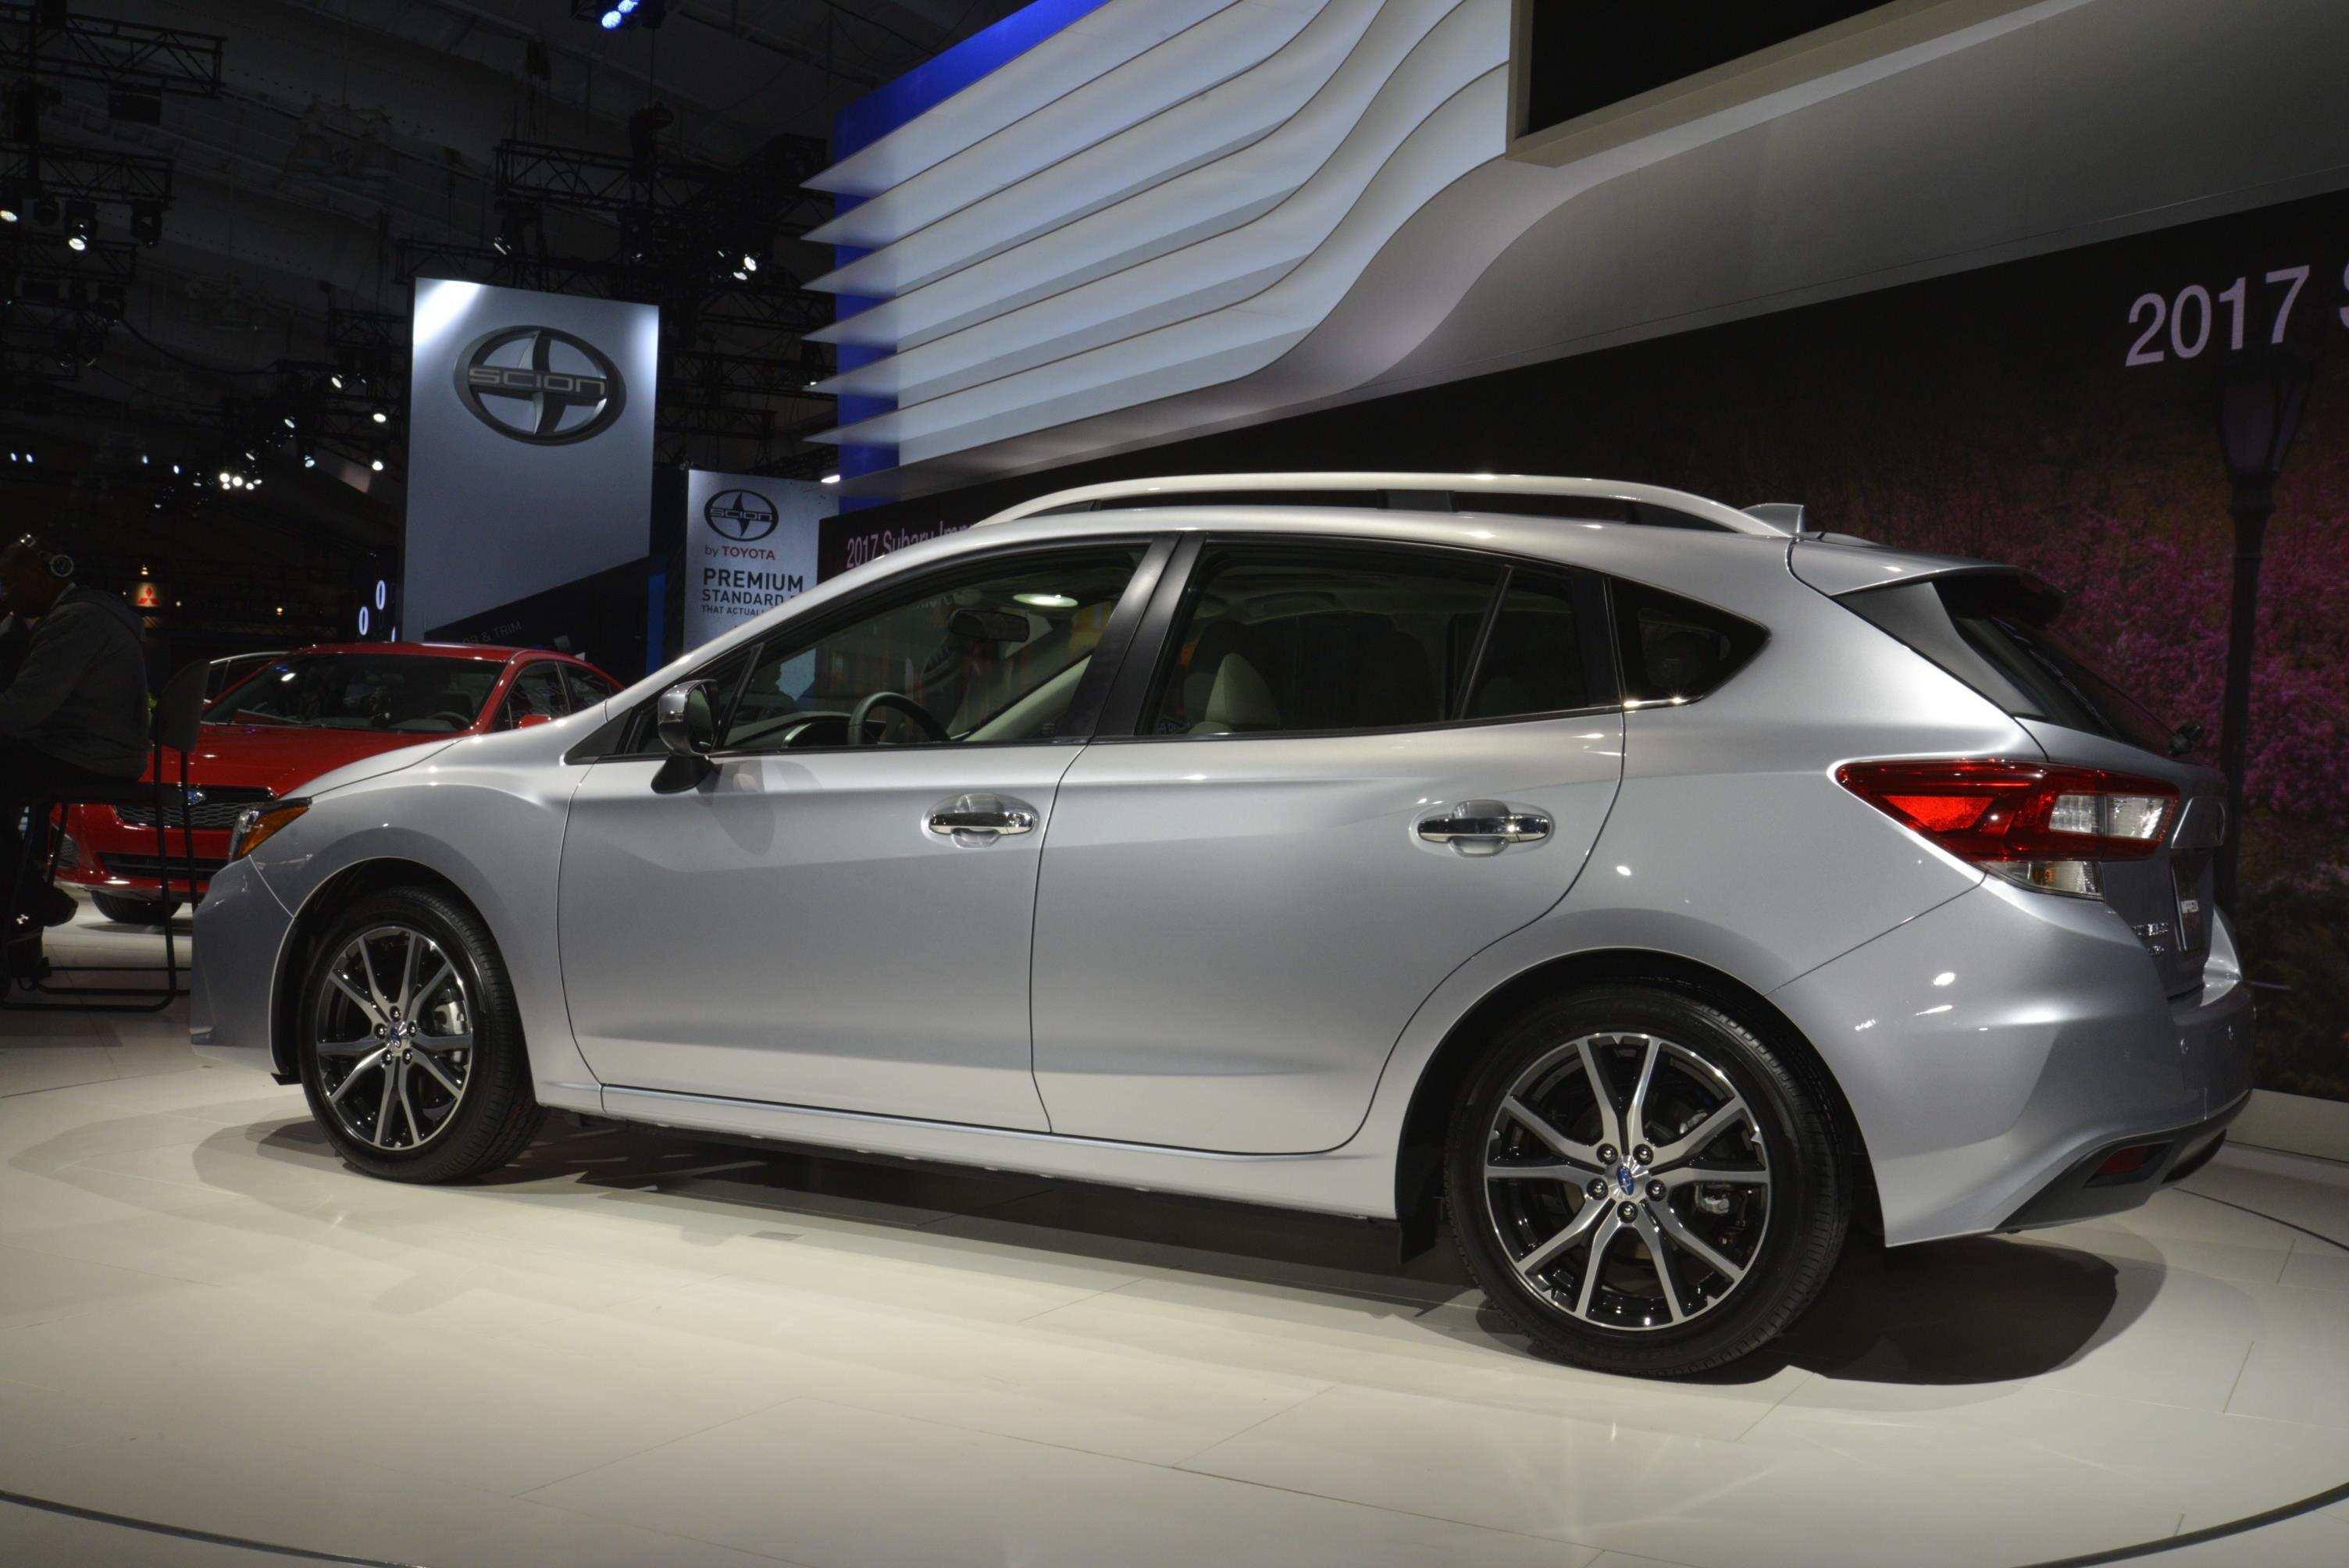 45 New 2019 Subaru Impreza 5 Door Exterior with 2019 Subaru Impreza 5 Door